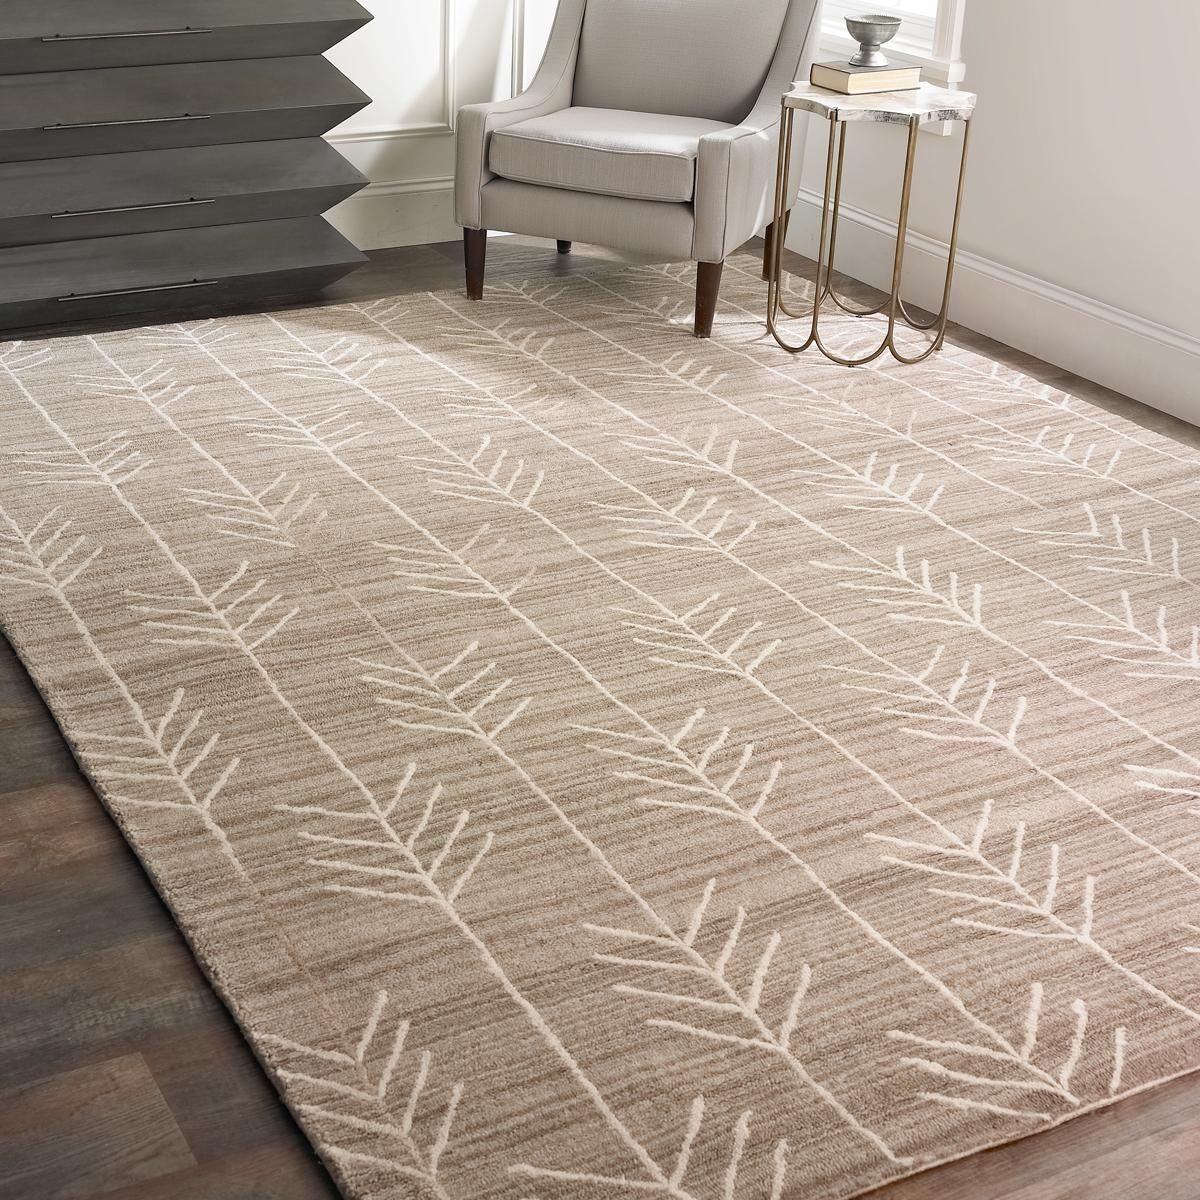 Day of The Dead Sugar Skull Area Rug Rug Carpet for Living Room Bedroom 53 x4